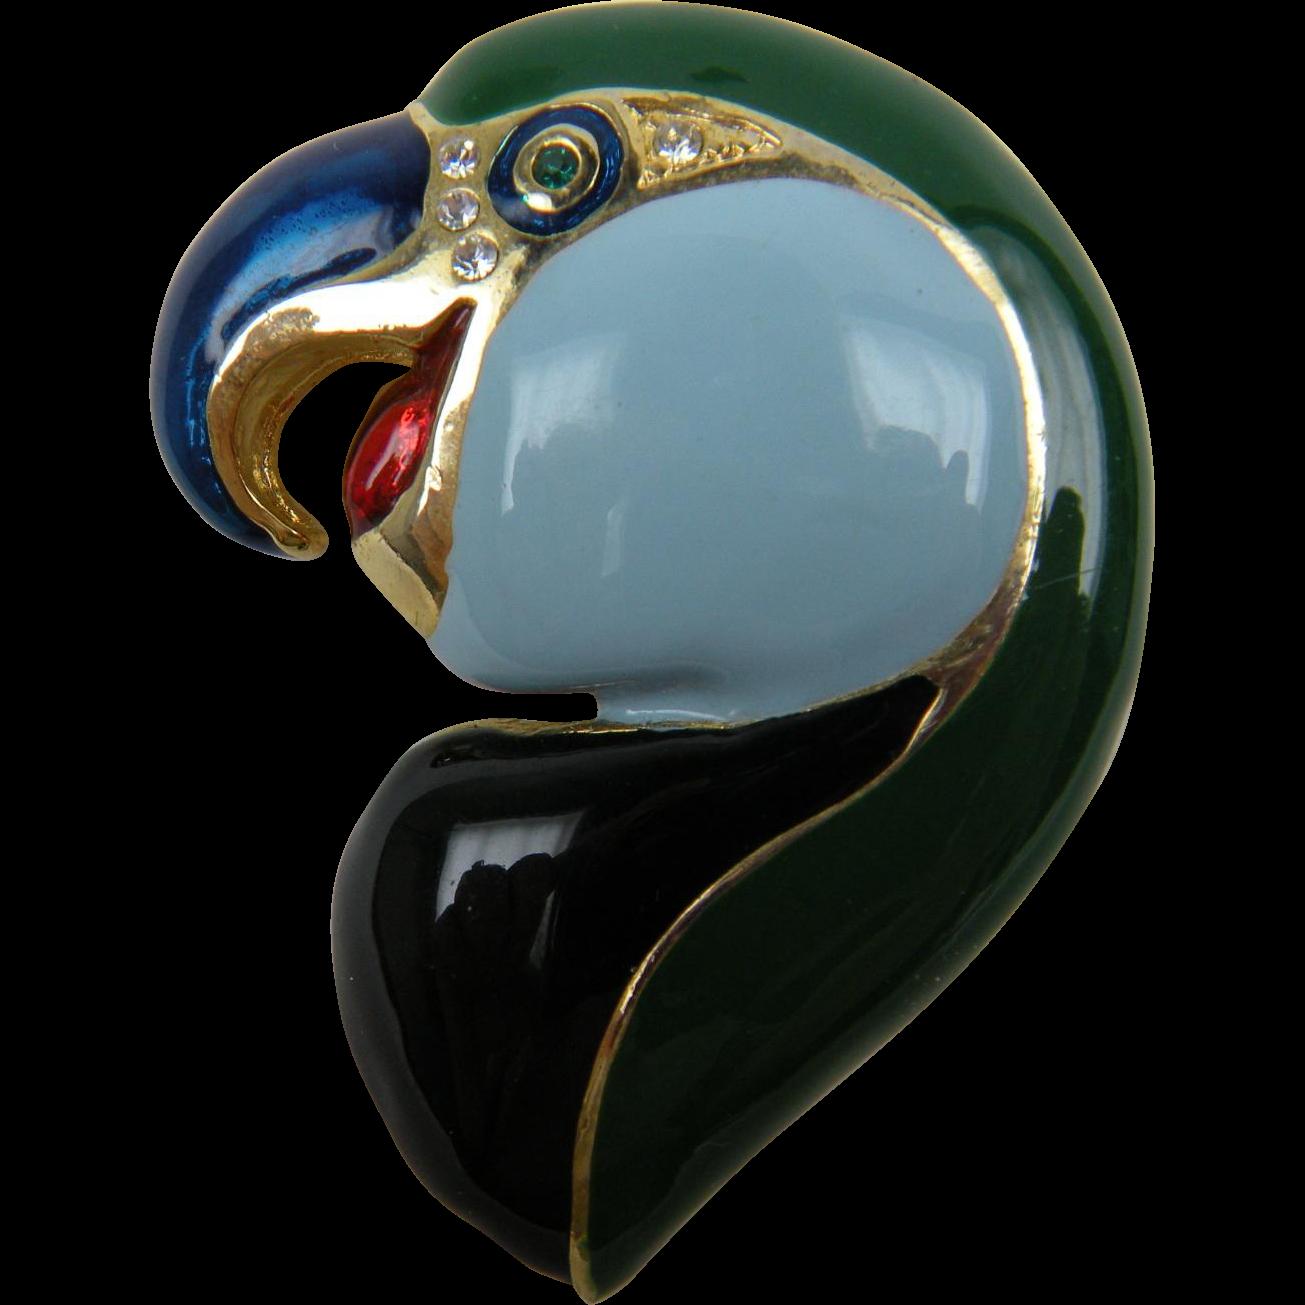 Elegant Enameled Parrot Pin